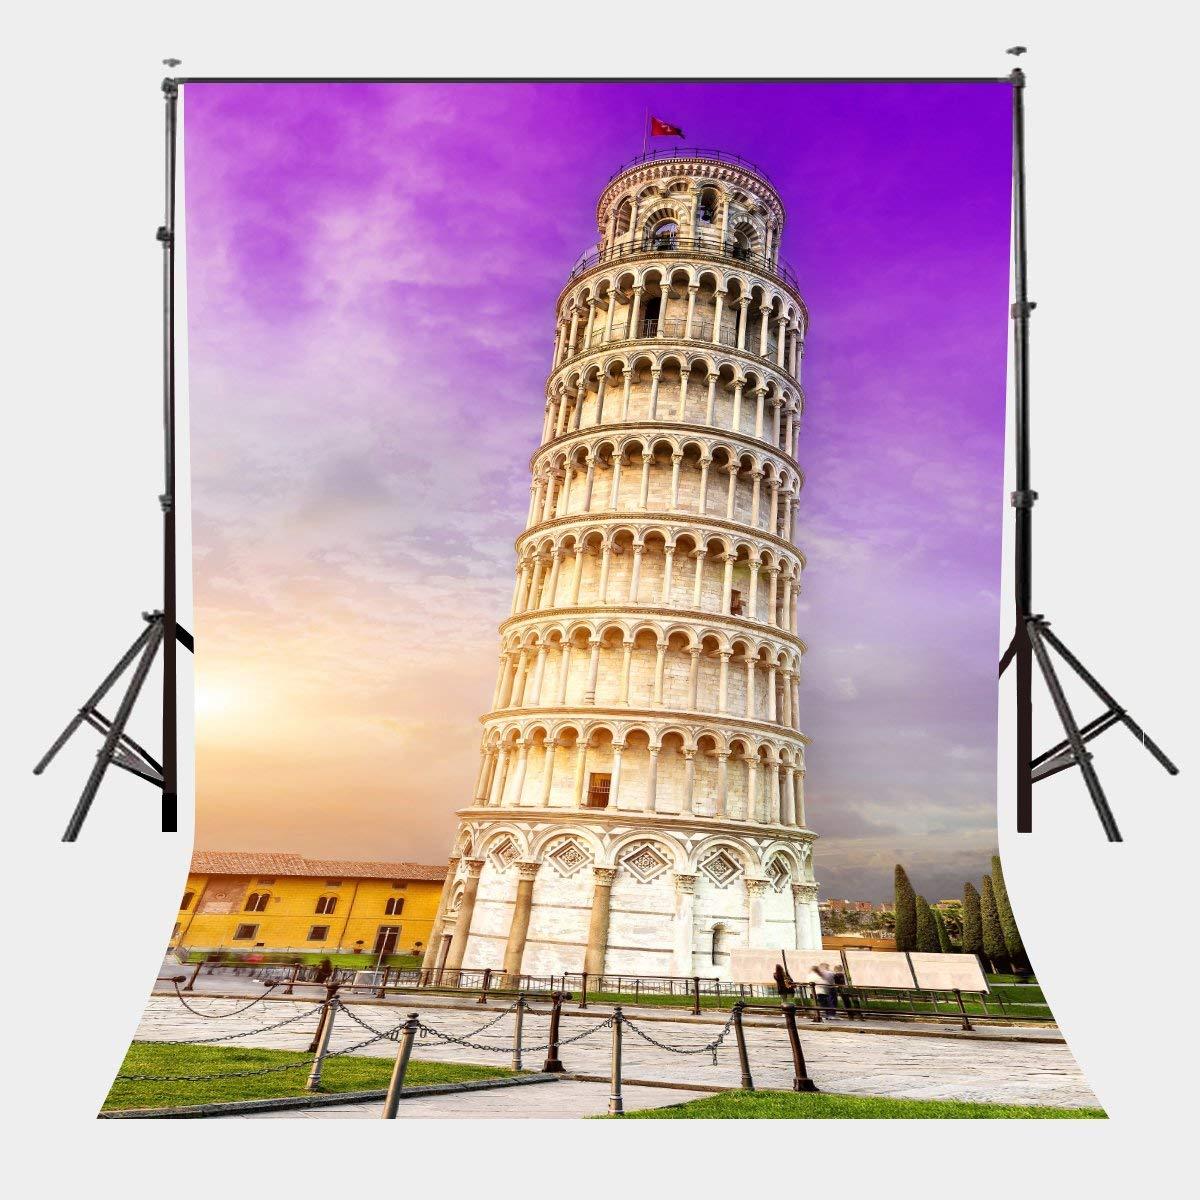 5x7ft Architectural Landscape Backdrop Leaning Tower of Pisa Studio Photography Background Ultra Violet Color Sky Backdrop